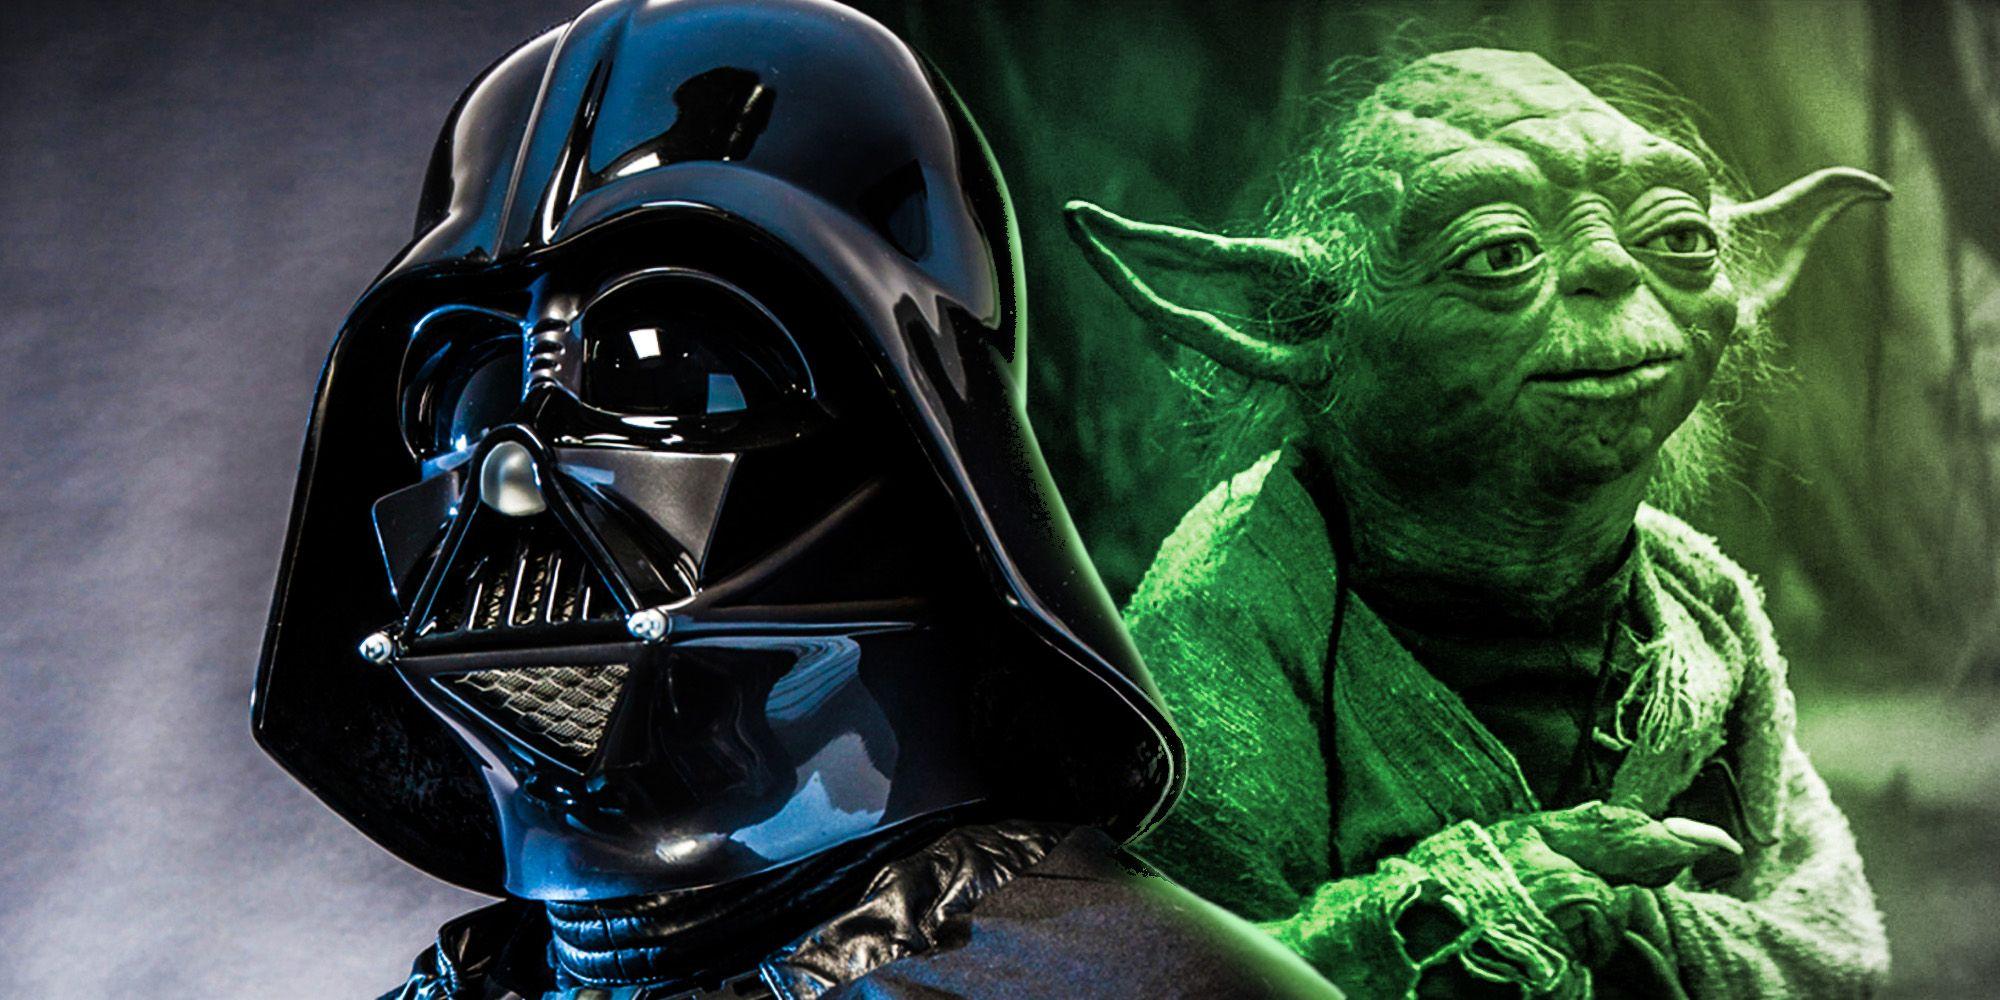 Star Wars: Who Would've Won If Yoda Fought Darth Vader